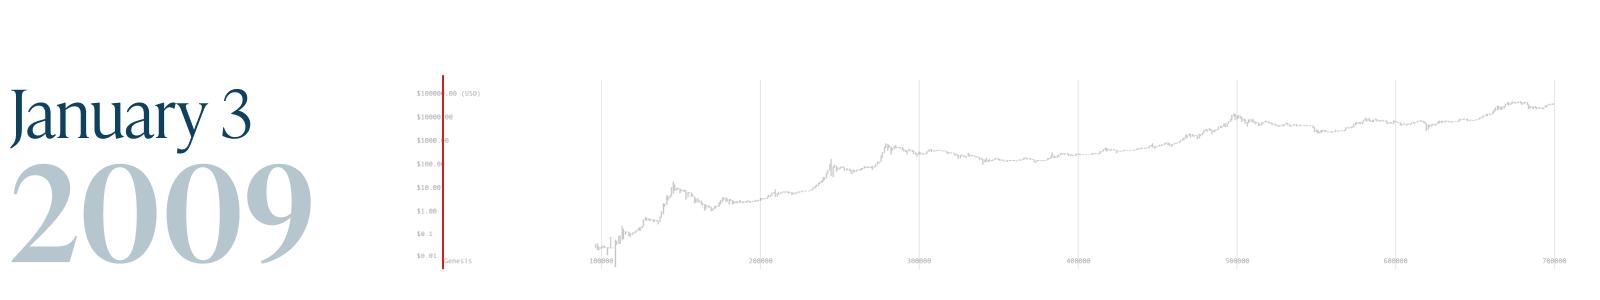 Monochrome_Bitcoin Block 700k_3 Jan 2009.png